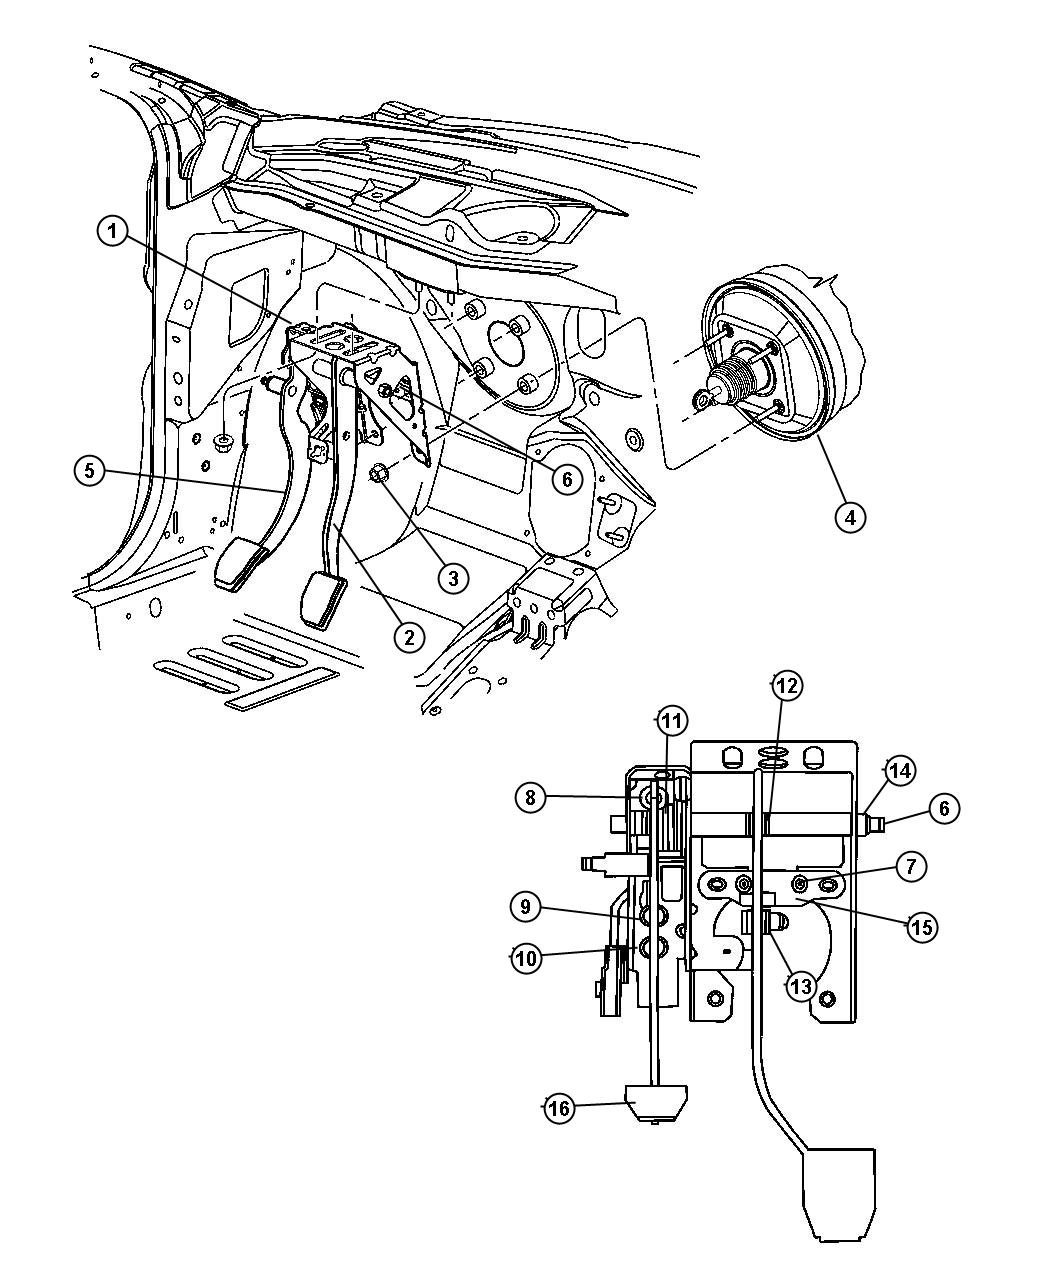 Service manual [2009 Chrysler Pt Cruiser Manual